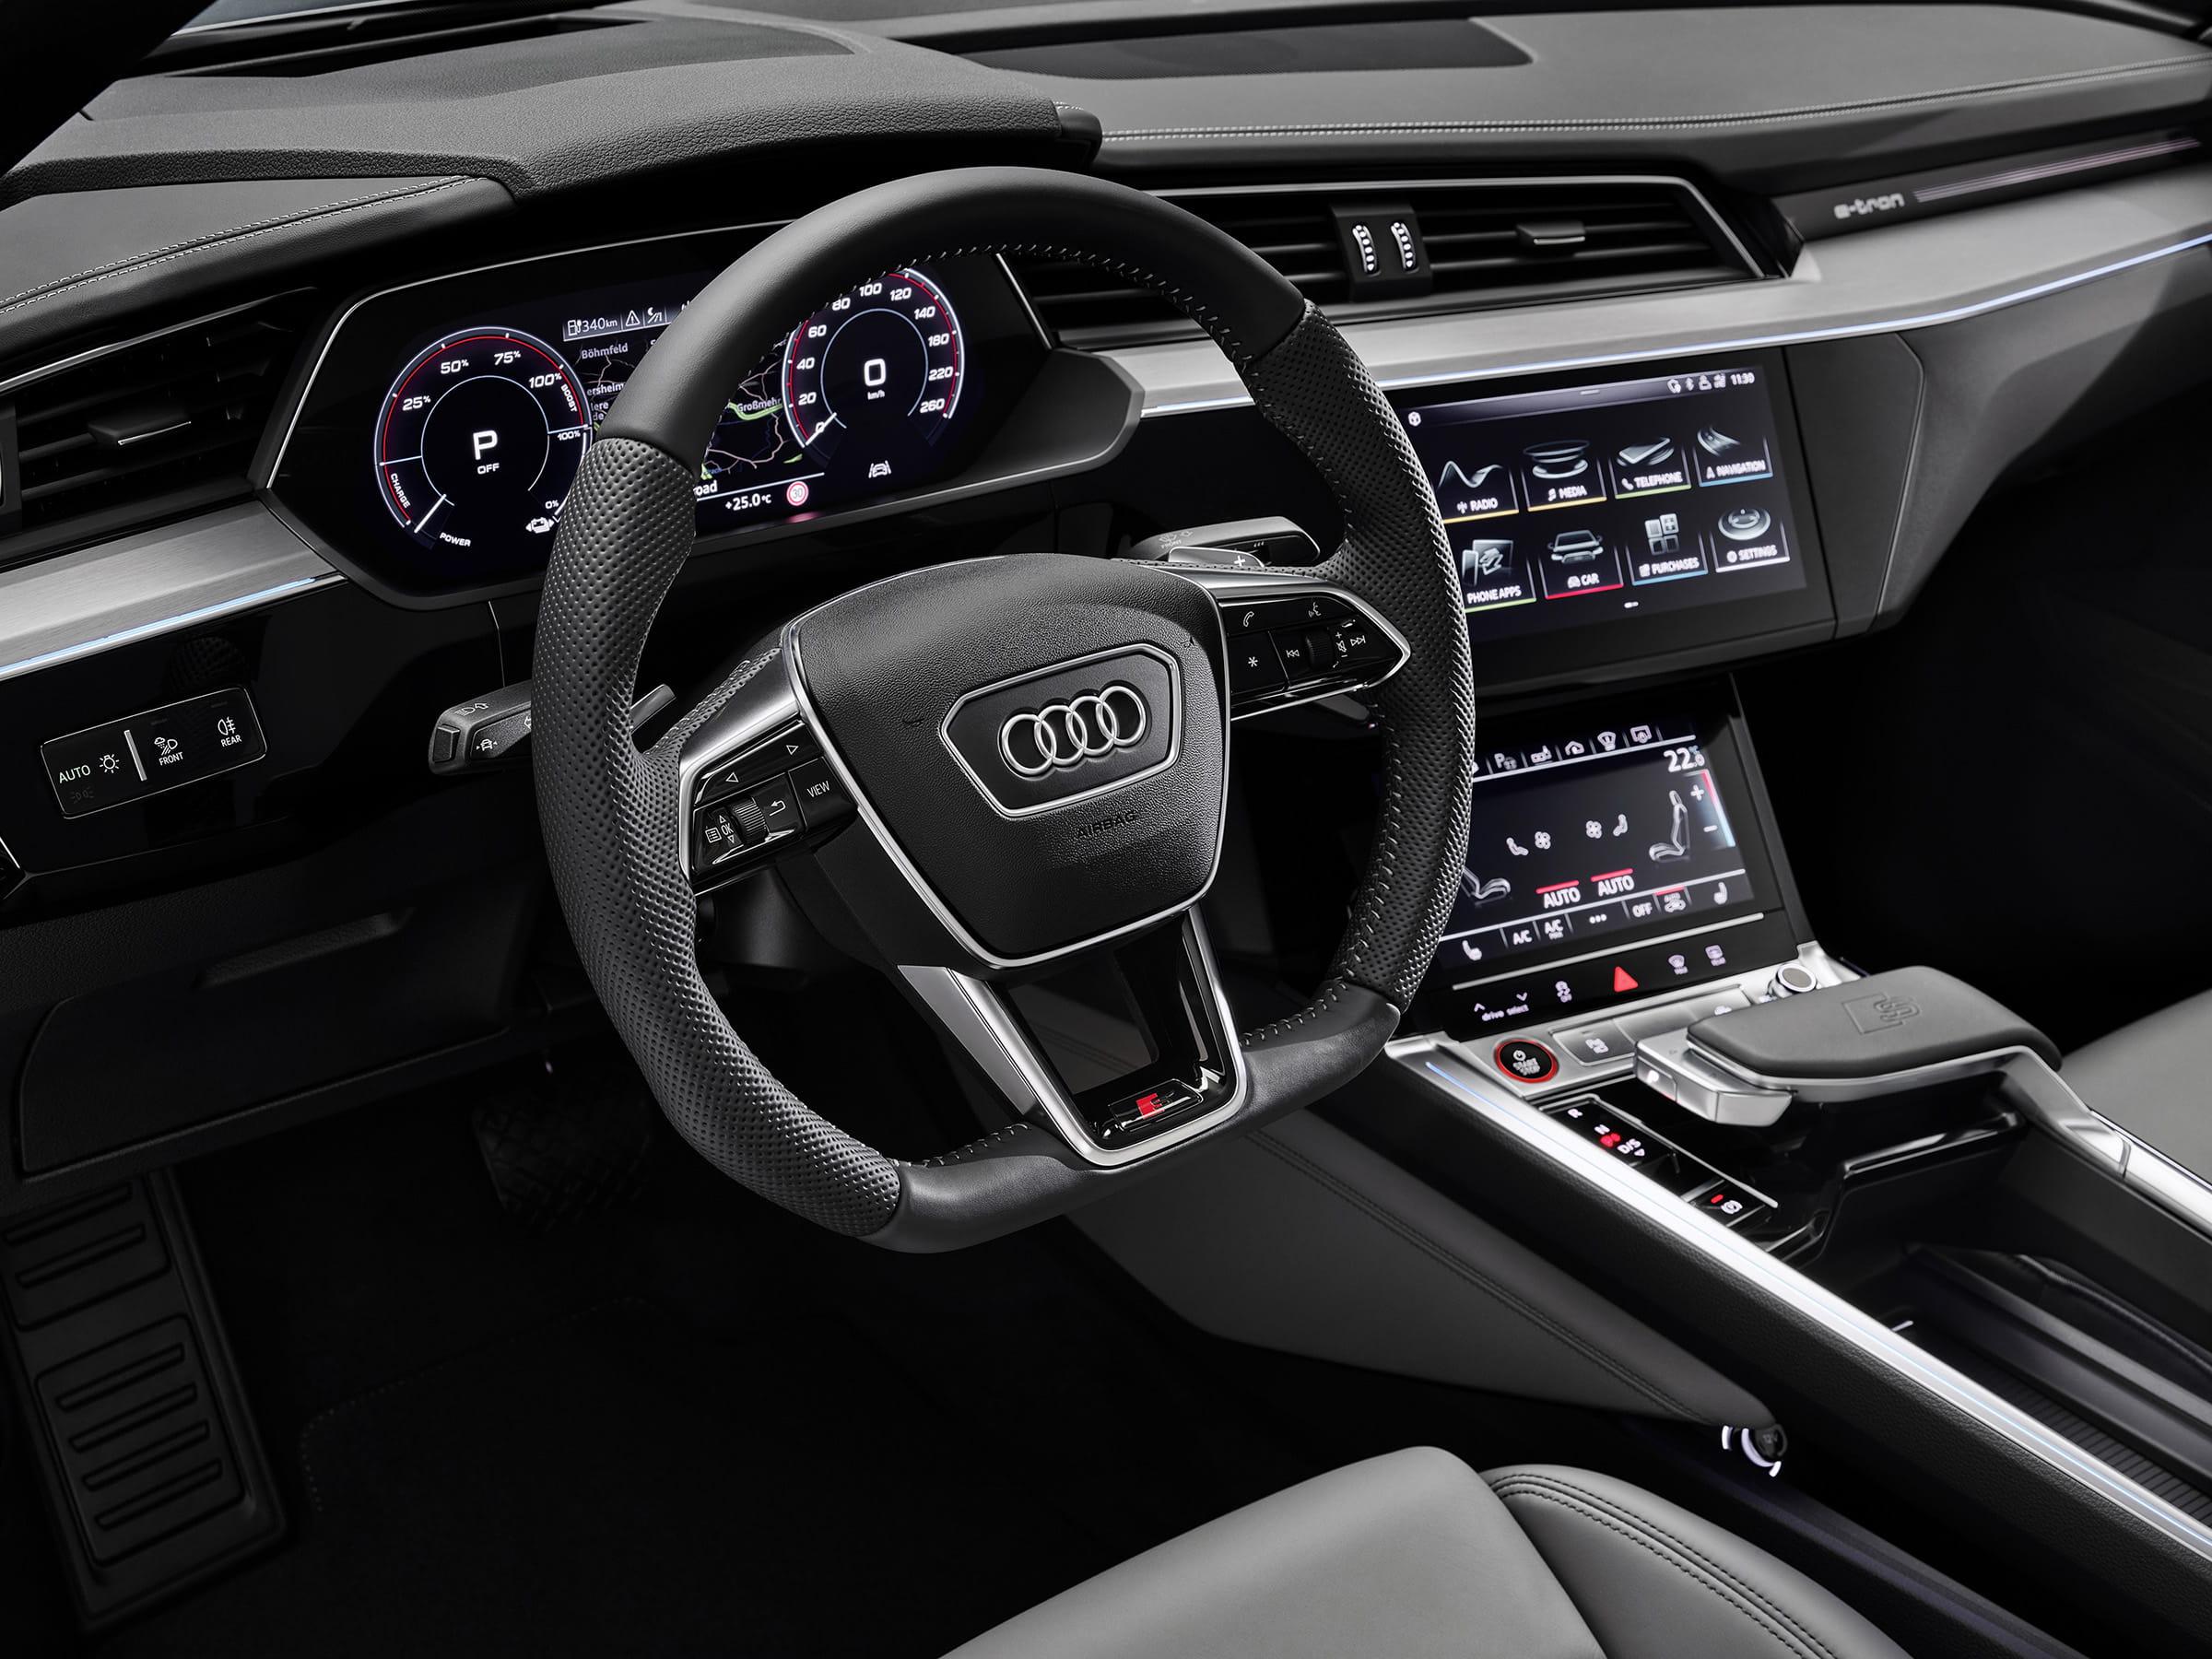 Audi e-tron S και e-tron S Sportback - Συστήματα ελέγχου, ψυχαγωγίας και βοήθειας